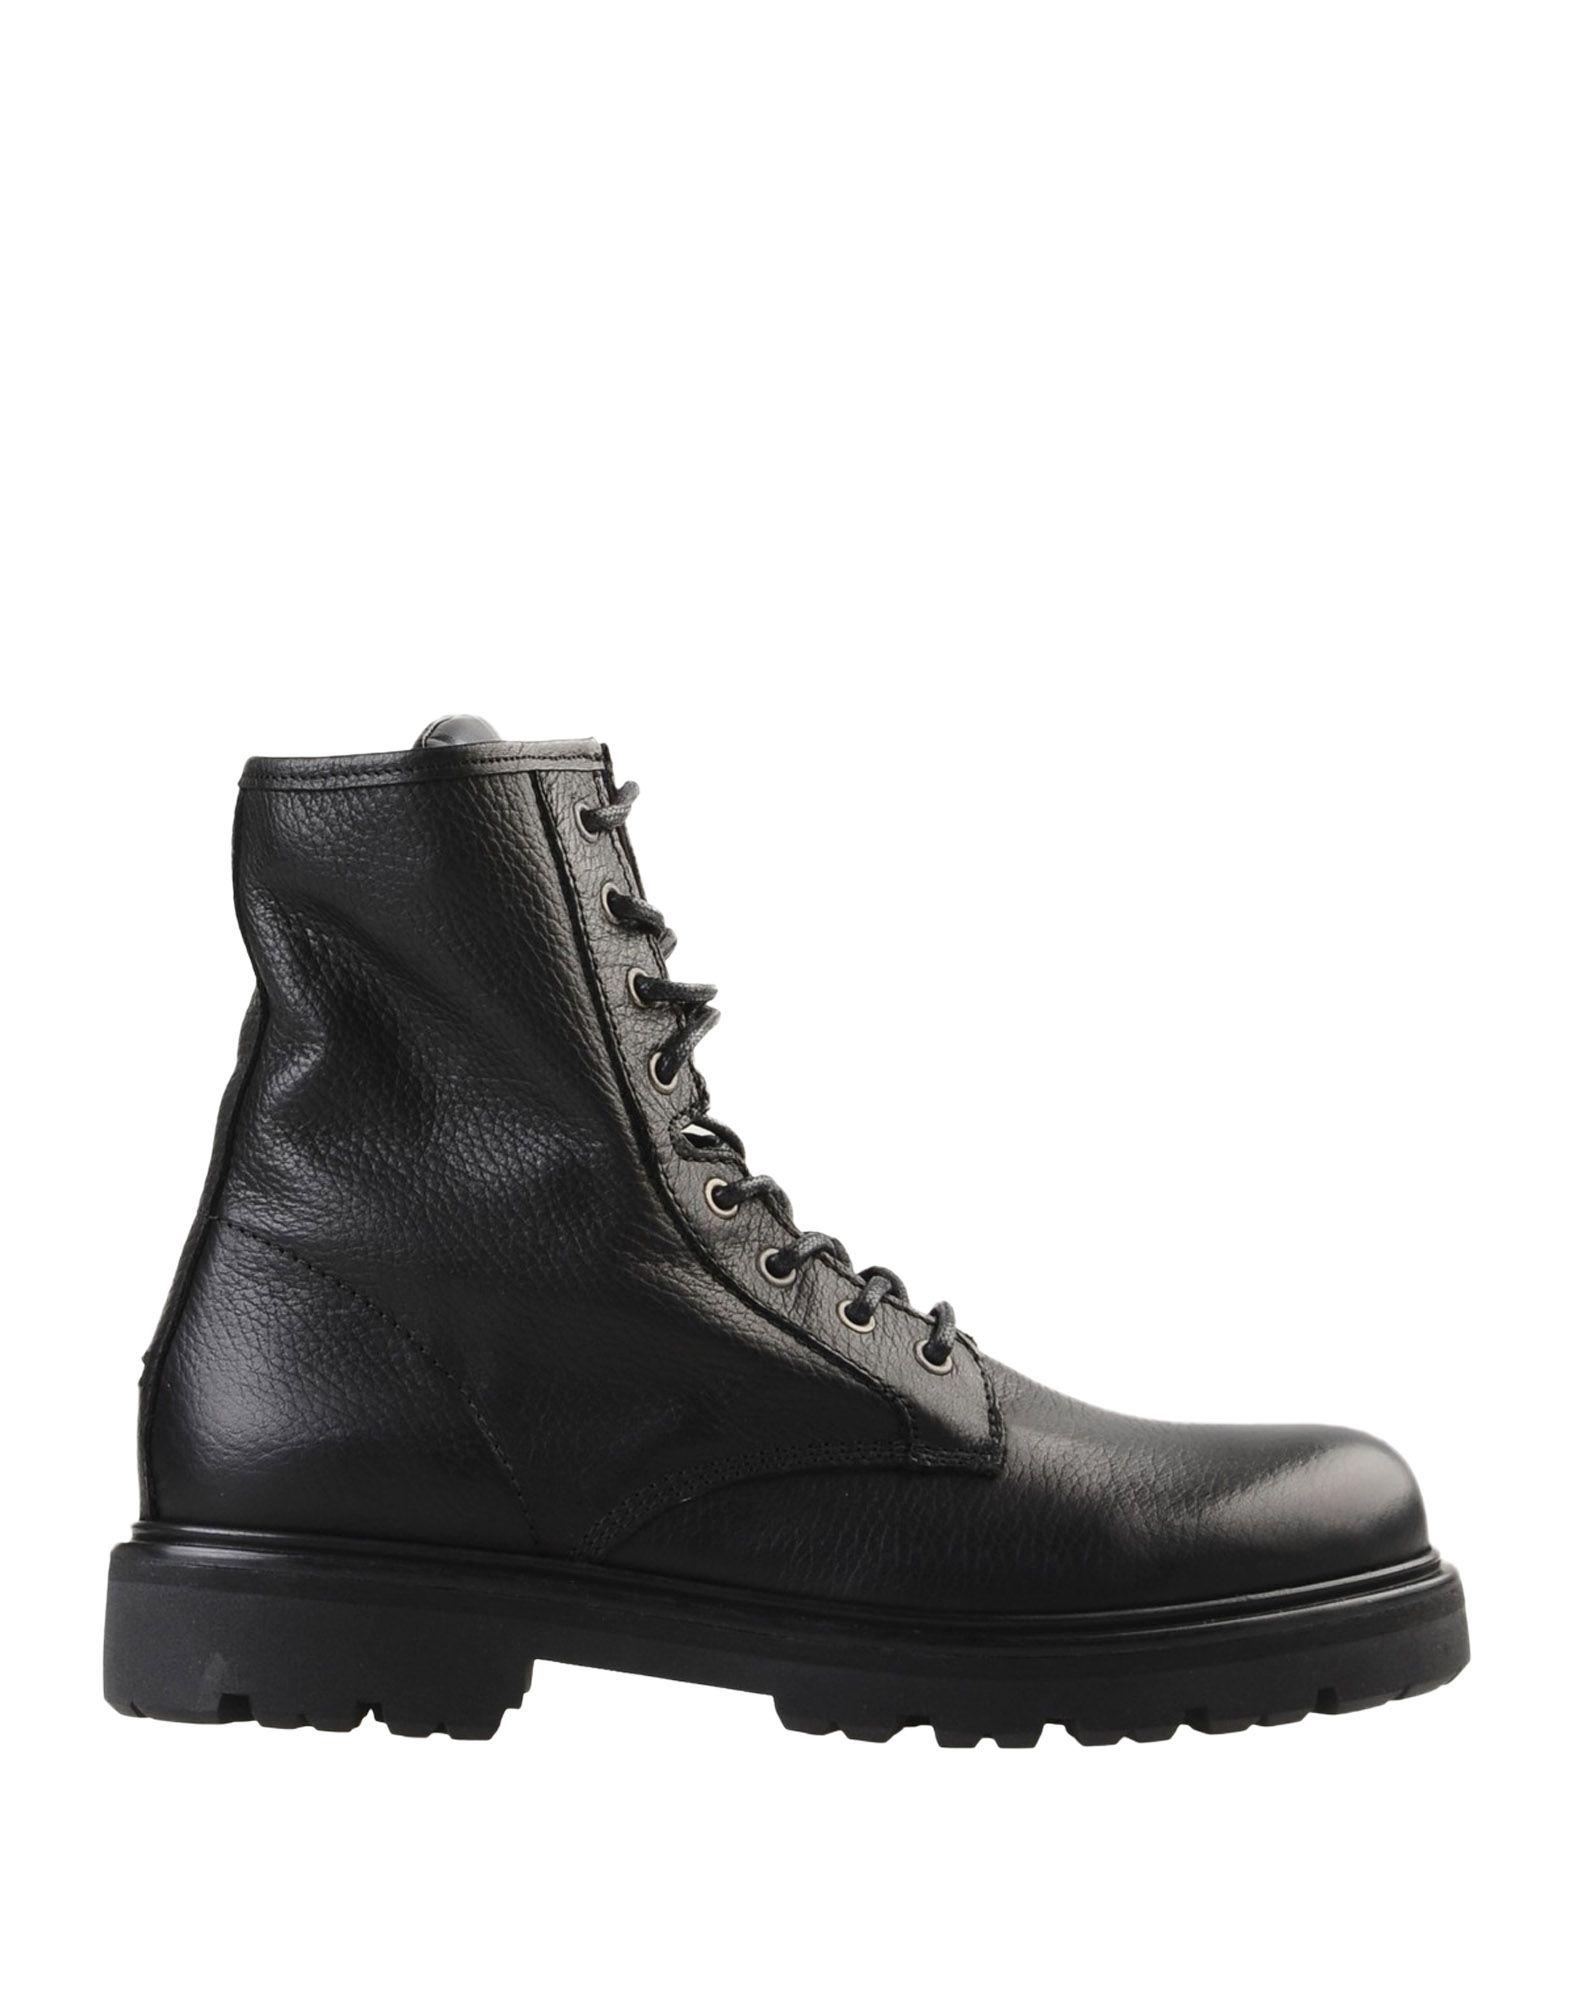 TOMMY HILFIGER Полусапоги и высокие ботинки ботинки tommy hilfiger fm0fm00901 403 midnight